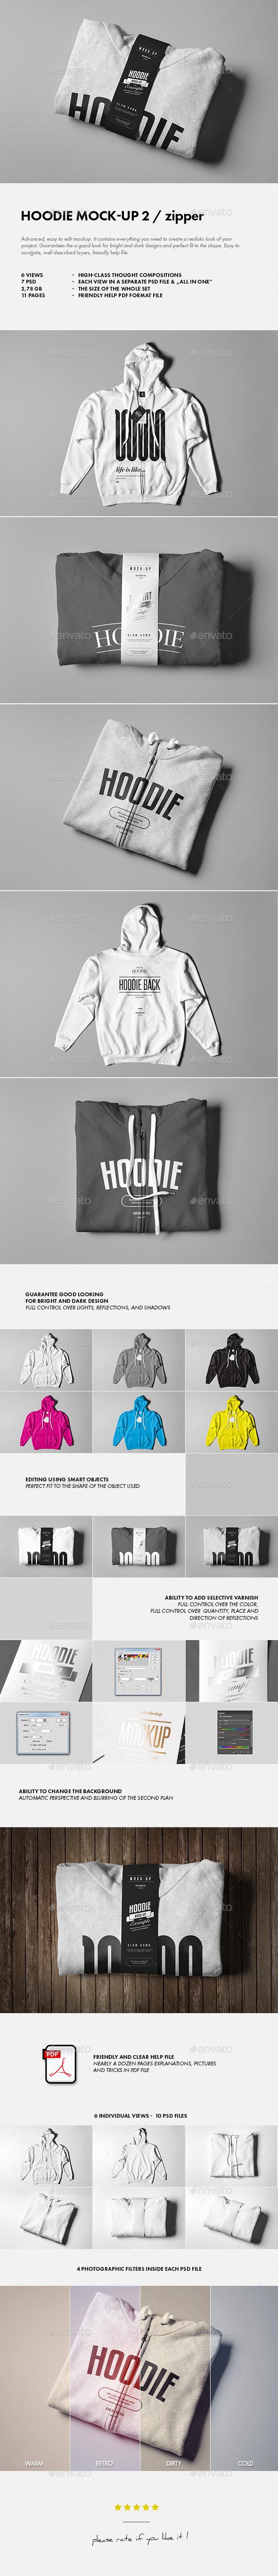 Hoodie Mock-up 2 - Apparel Product Mock-Ups